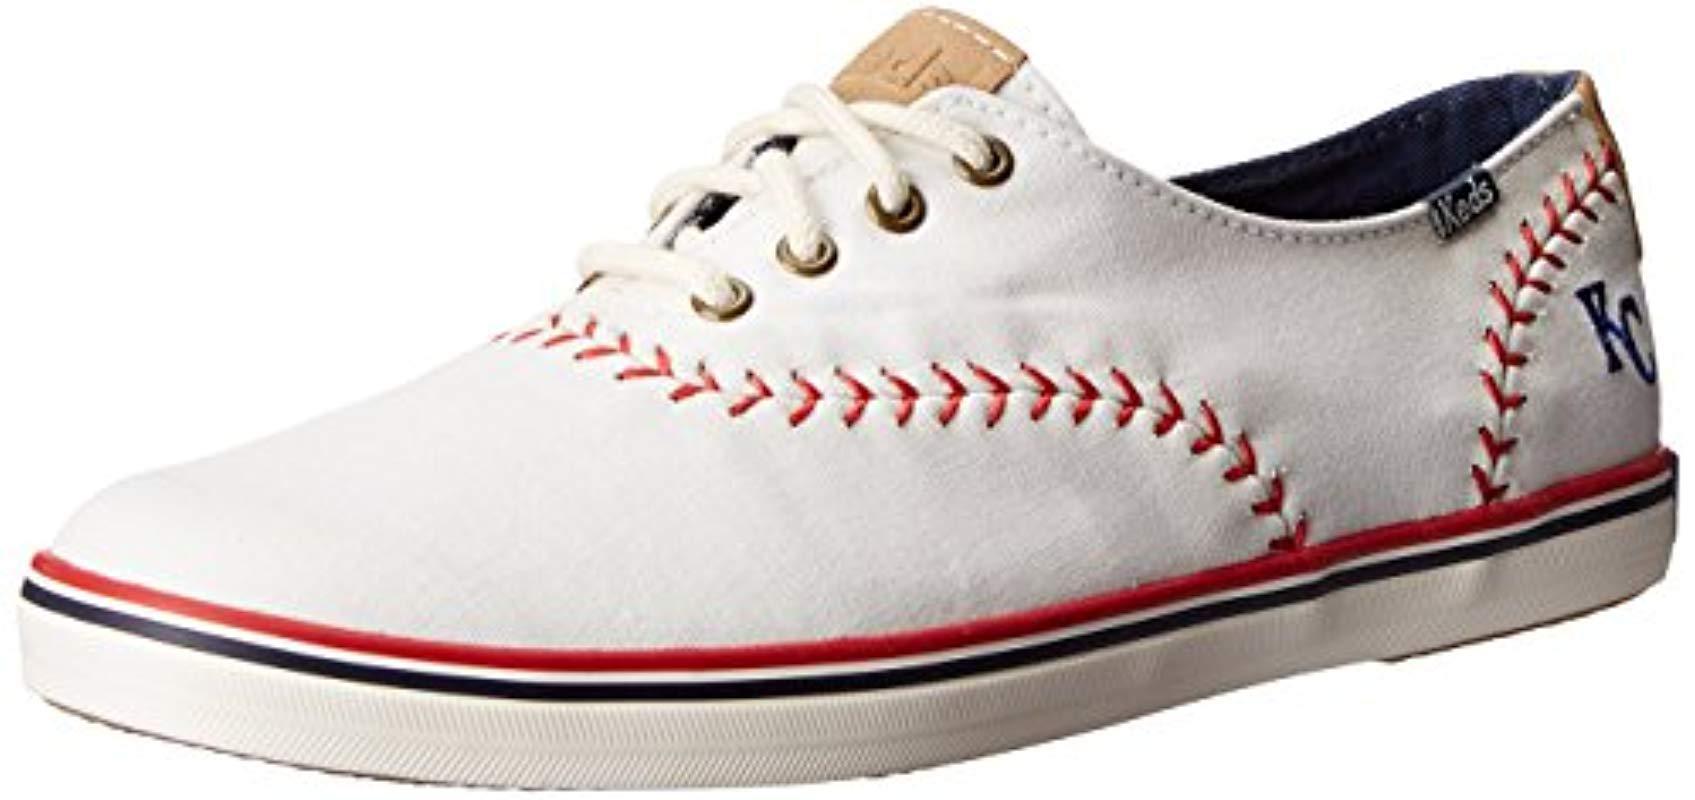 033b818736b7b Keds - Multicolor Champion Mlb Pennant Baseball Fashion Sneaker - Lyst.  View fullscreen